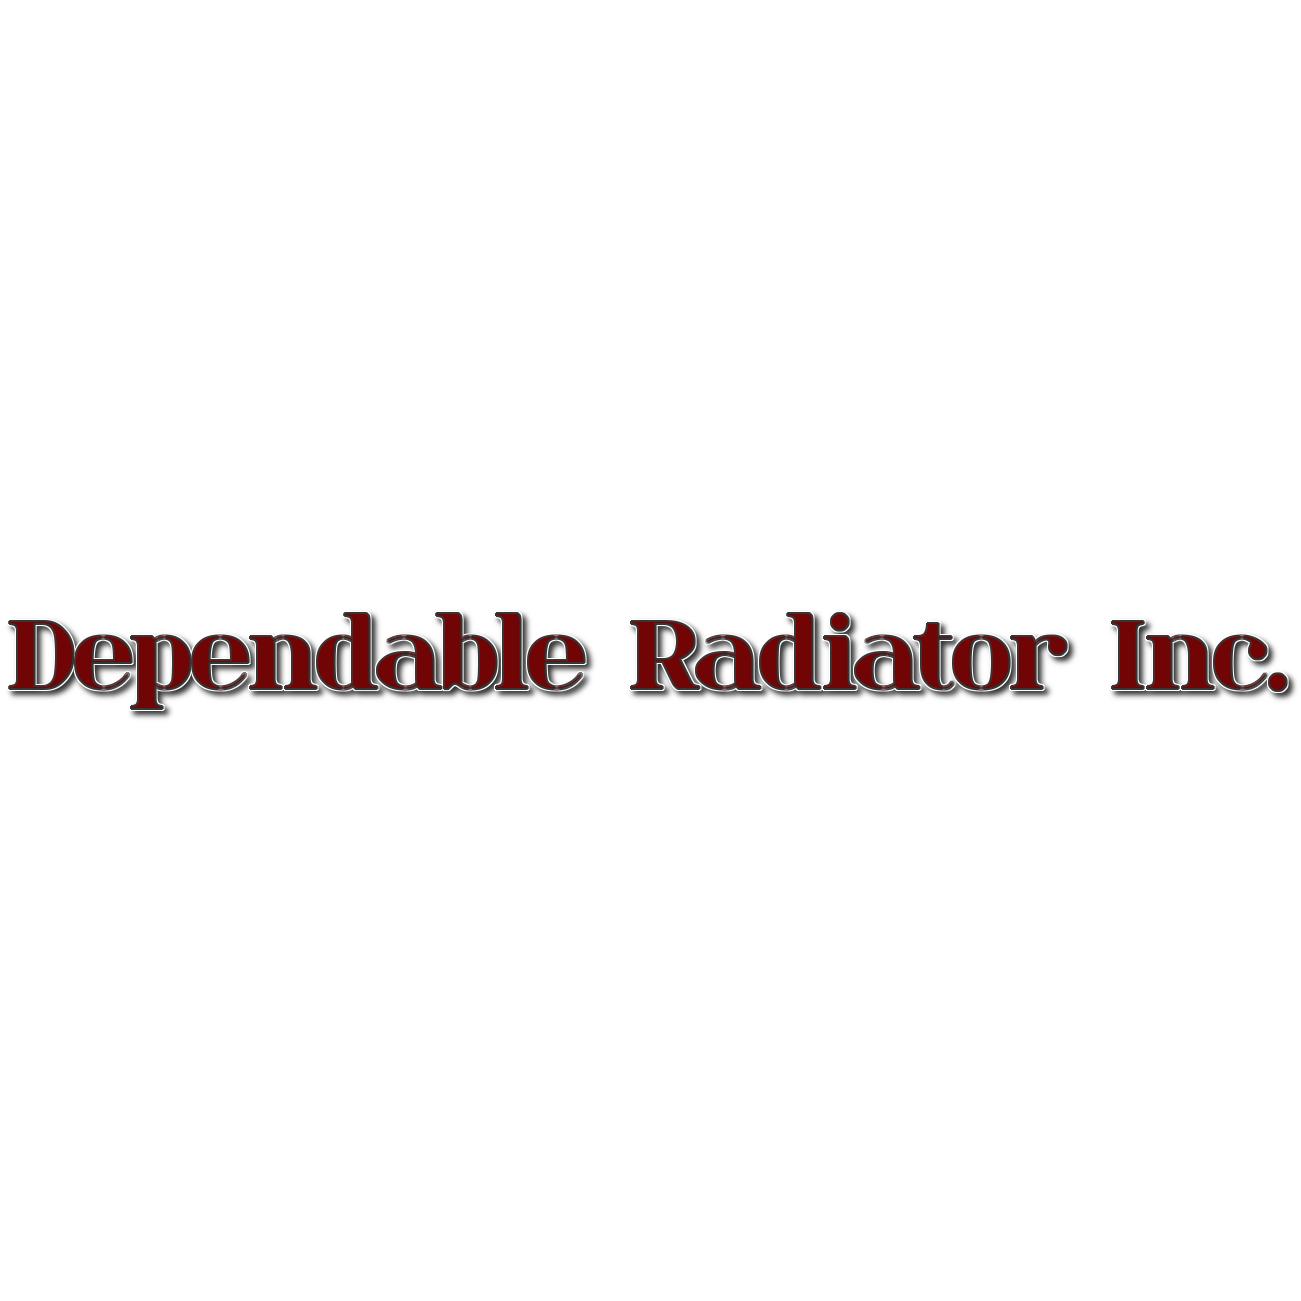 Dependable Radiator Inc - Port Richey, FL 34668 - (727)847-2005 | ShowMeLocal.com